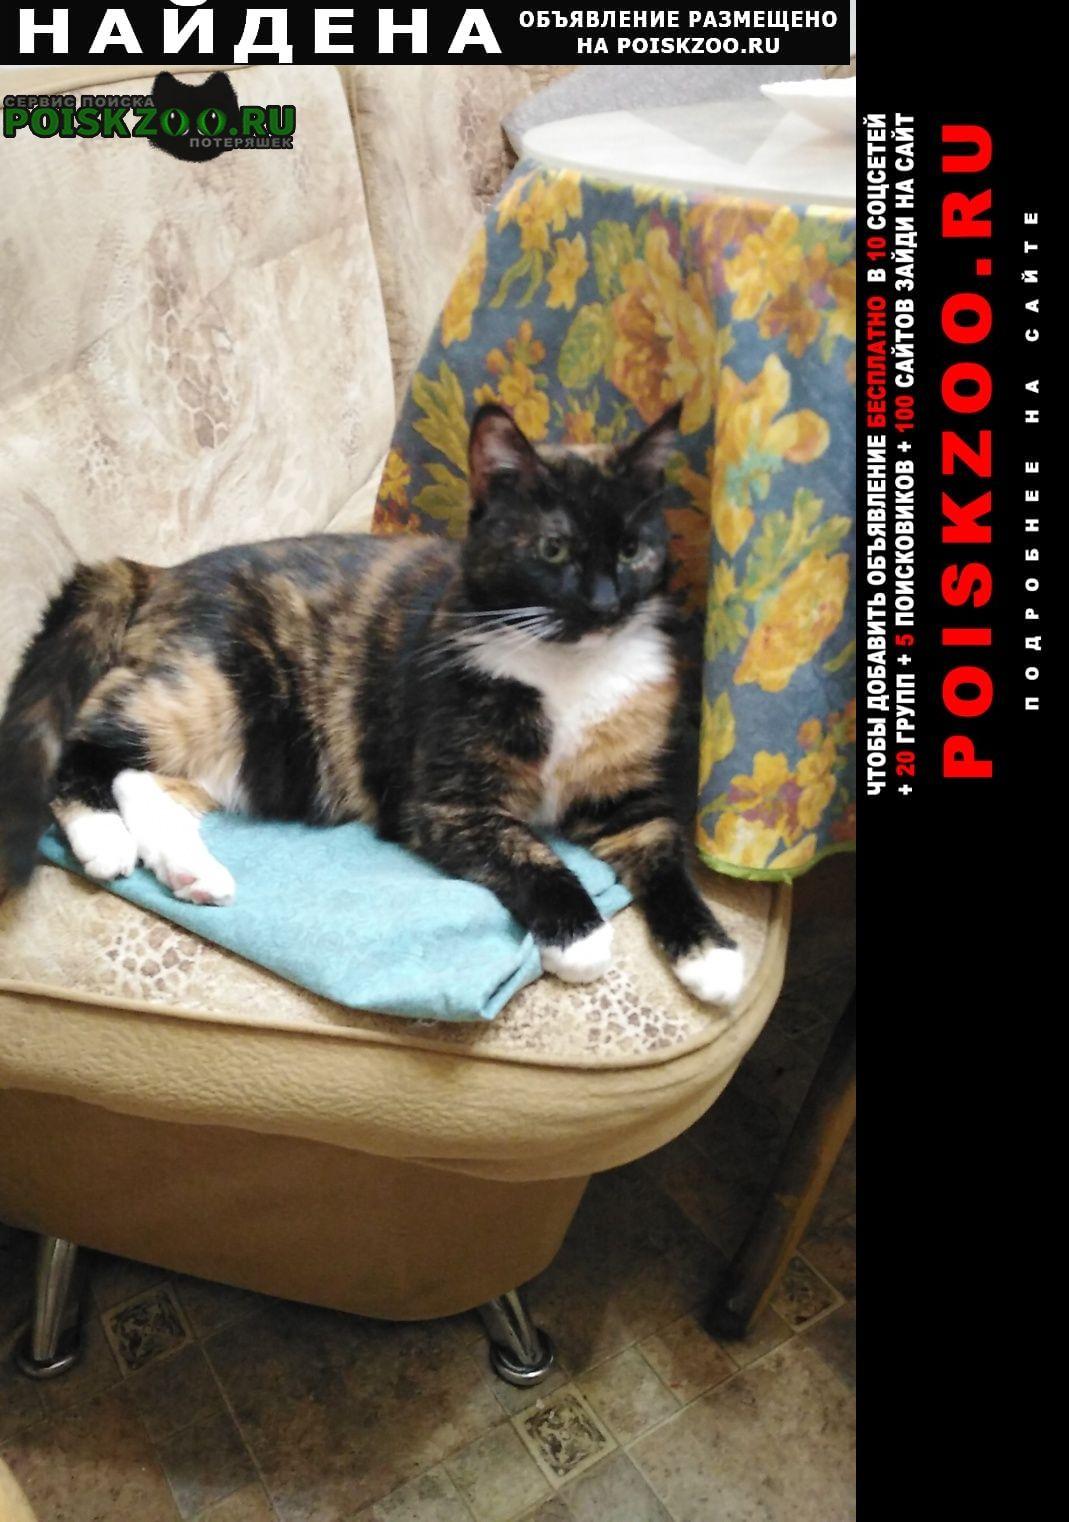 Найдена кошка я Санкт-Петербург